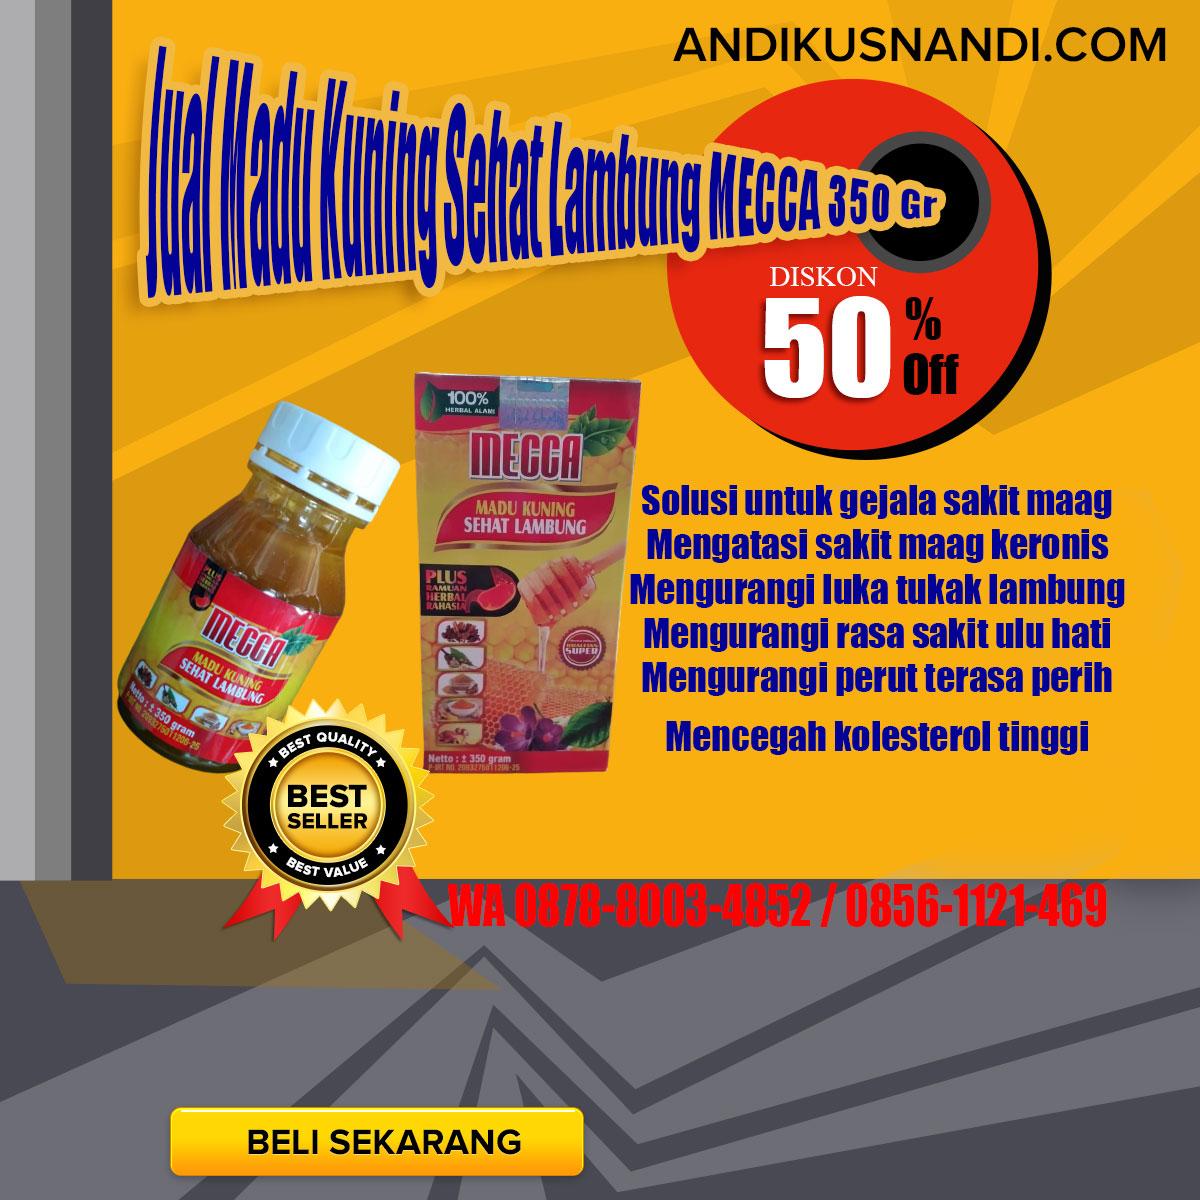 WA 0878-8003-4852 Jual Madu Kuning Sehat Lambung MECCA 350 Gr